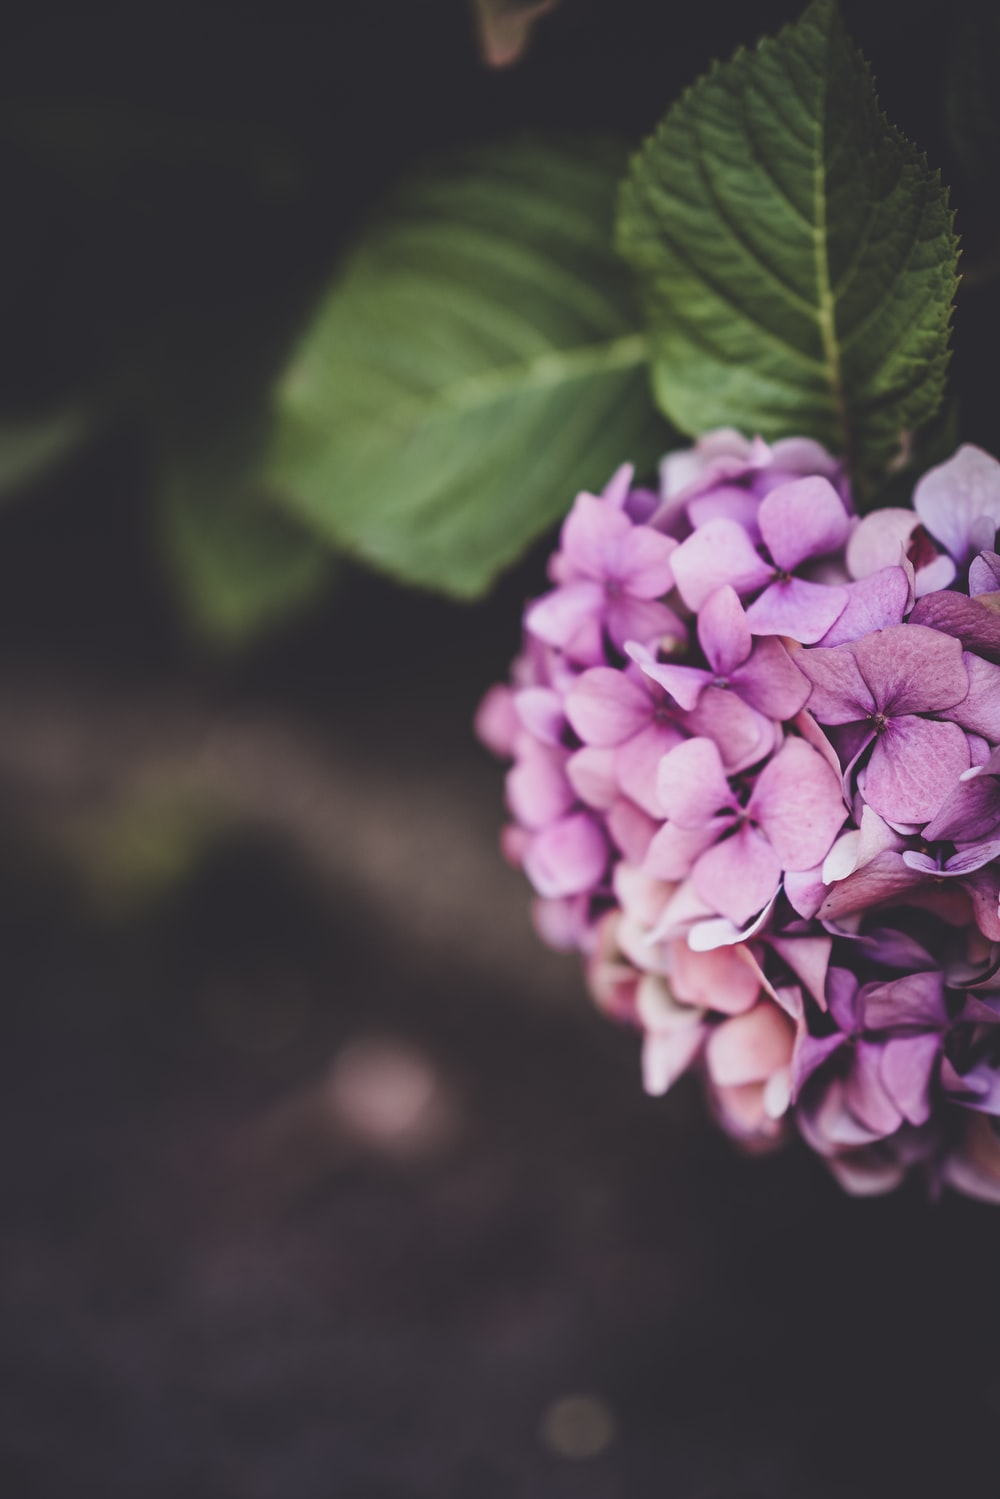 close-up photography of purple petal flowers